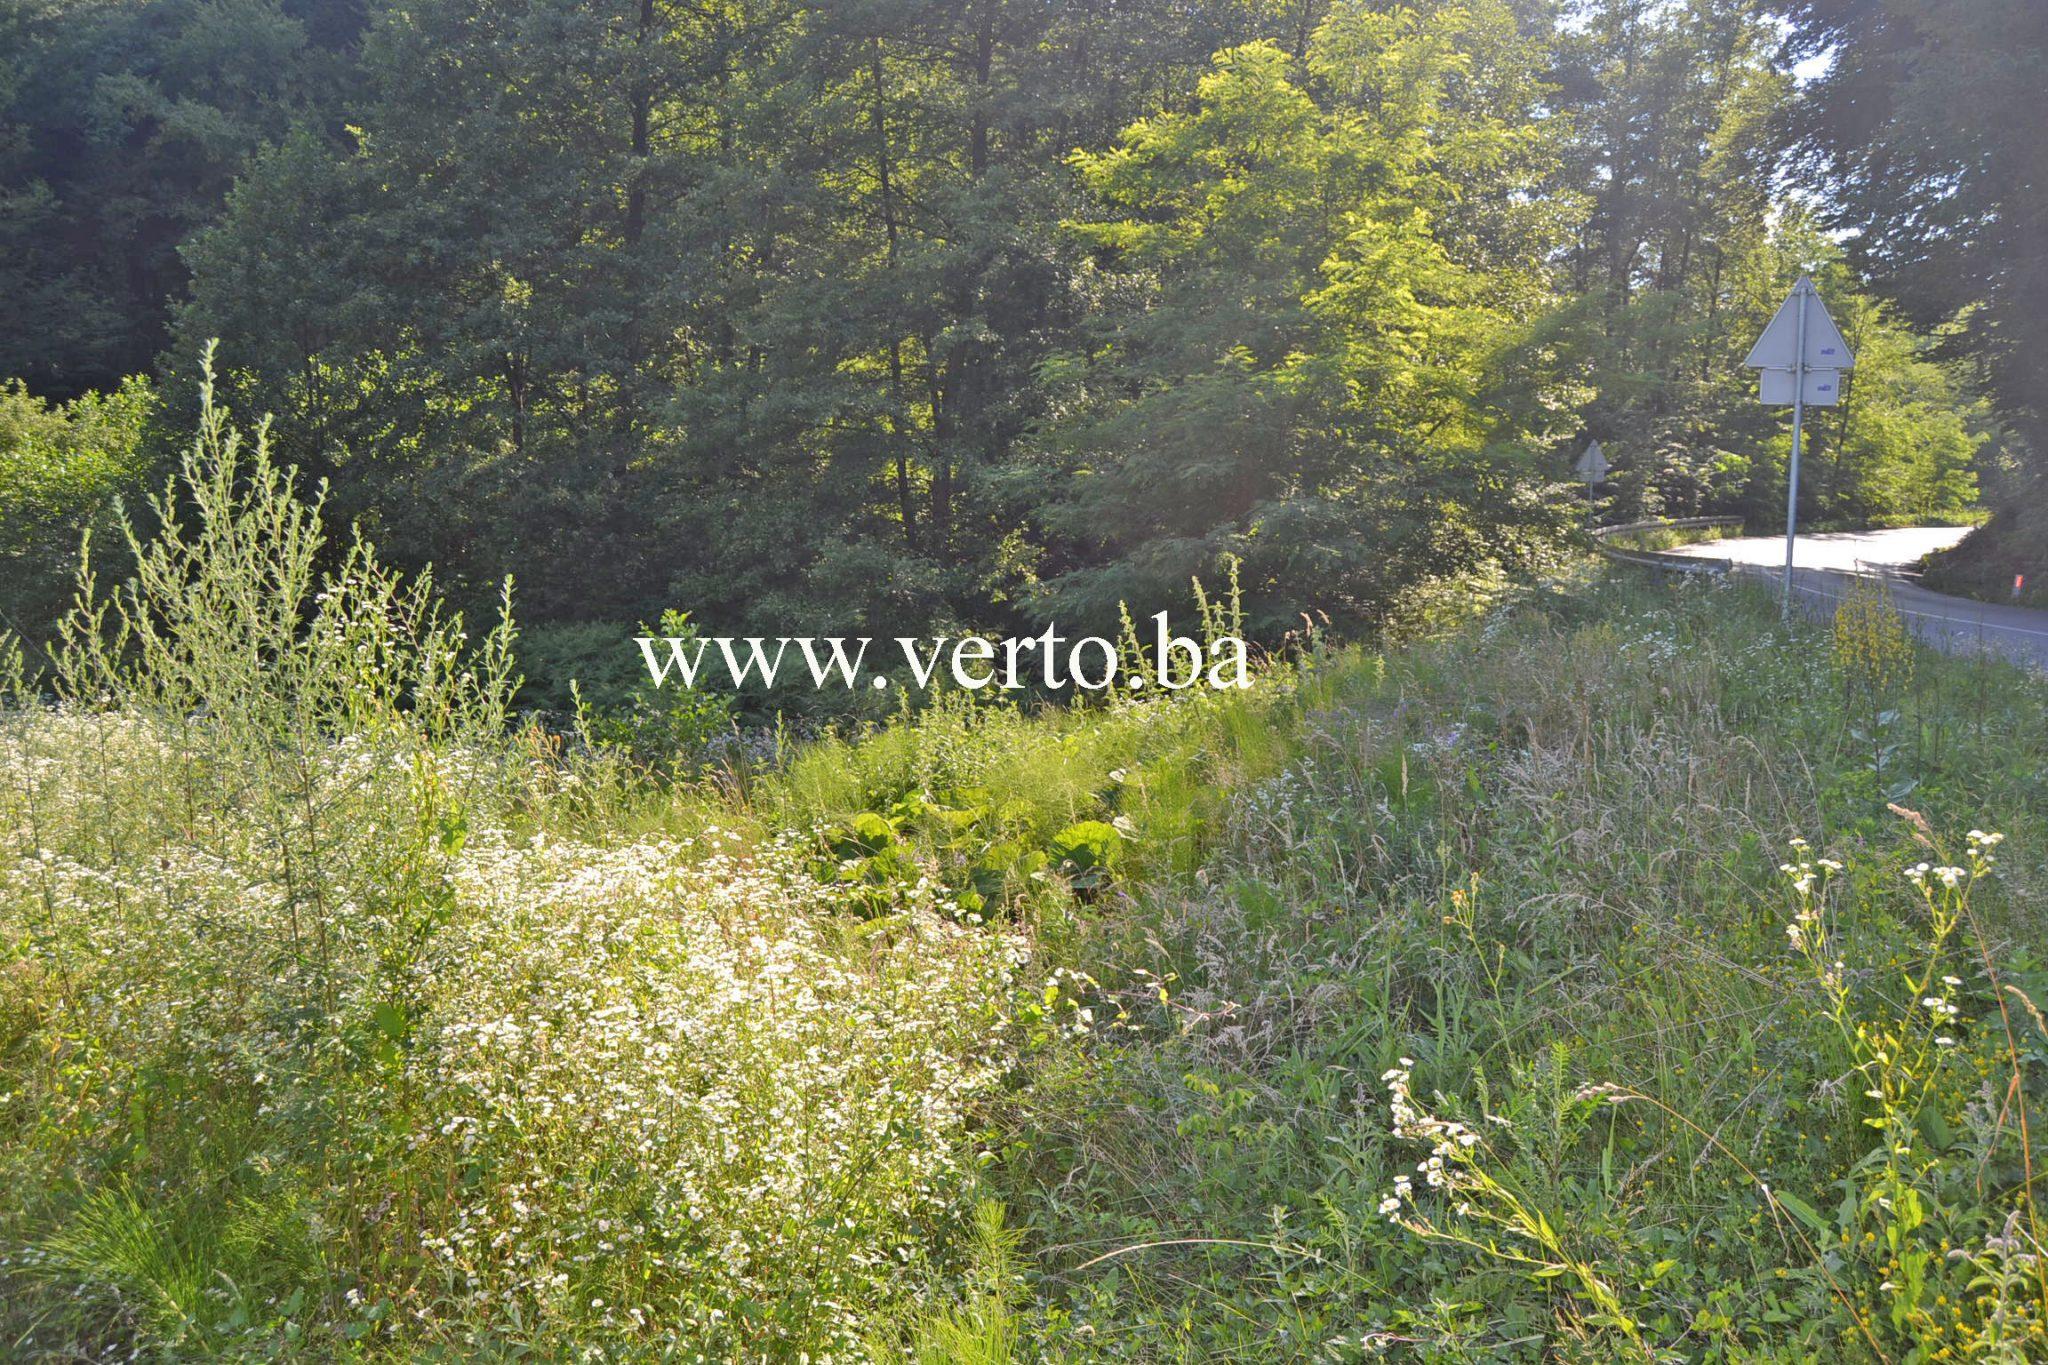 Zemljisna parcela 1.898 m2, Par Selo, Tuzla